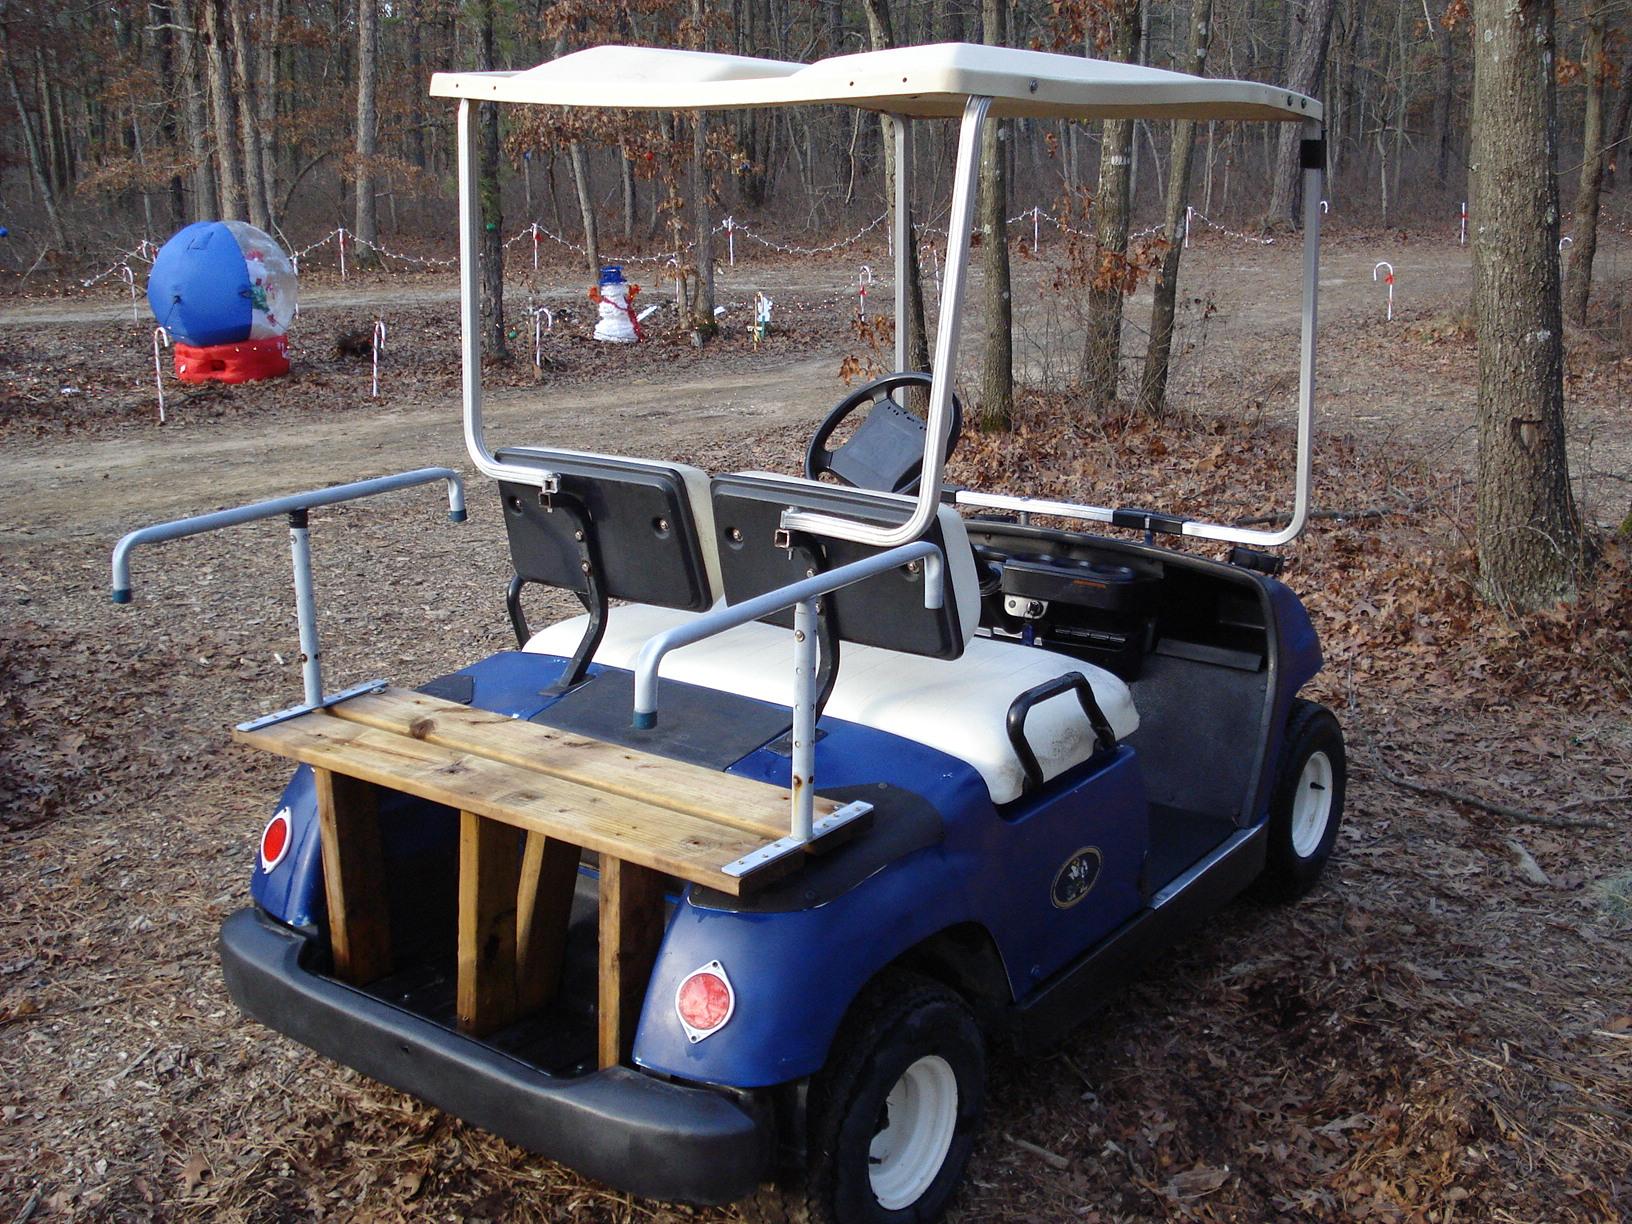 Badass Club Car Custom Golf Cart Is Built For Cruising in addition Ckdgolfcarts in addition Yamahagolf additionally 11 Golf Carts Guaranteed Turn Heads Your Club together with Custom Golf Carts Gallery. on yamaha golf cart bodies